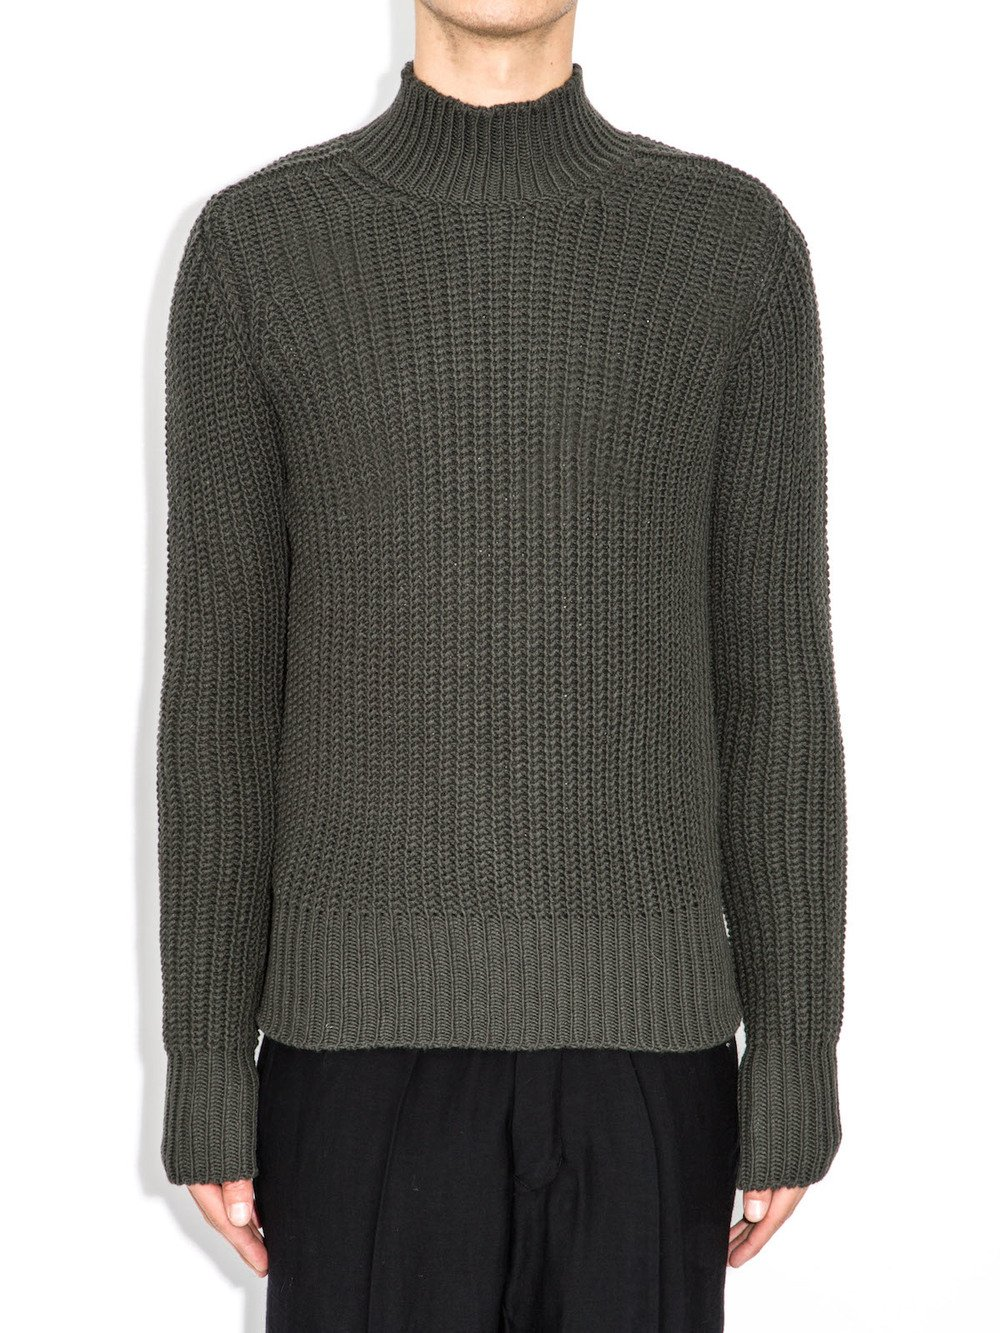 rick owens grey sweater